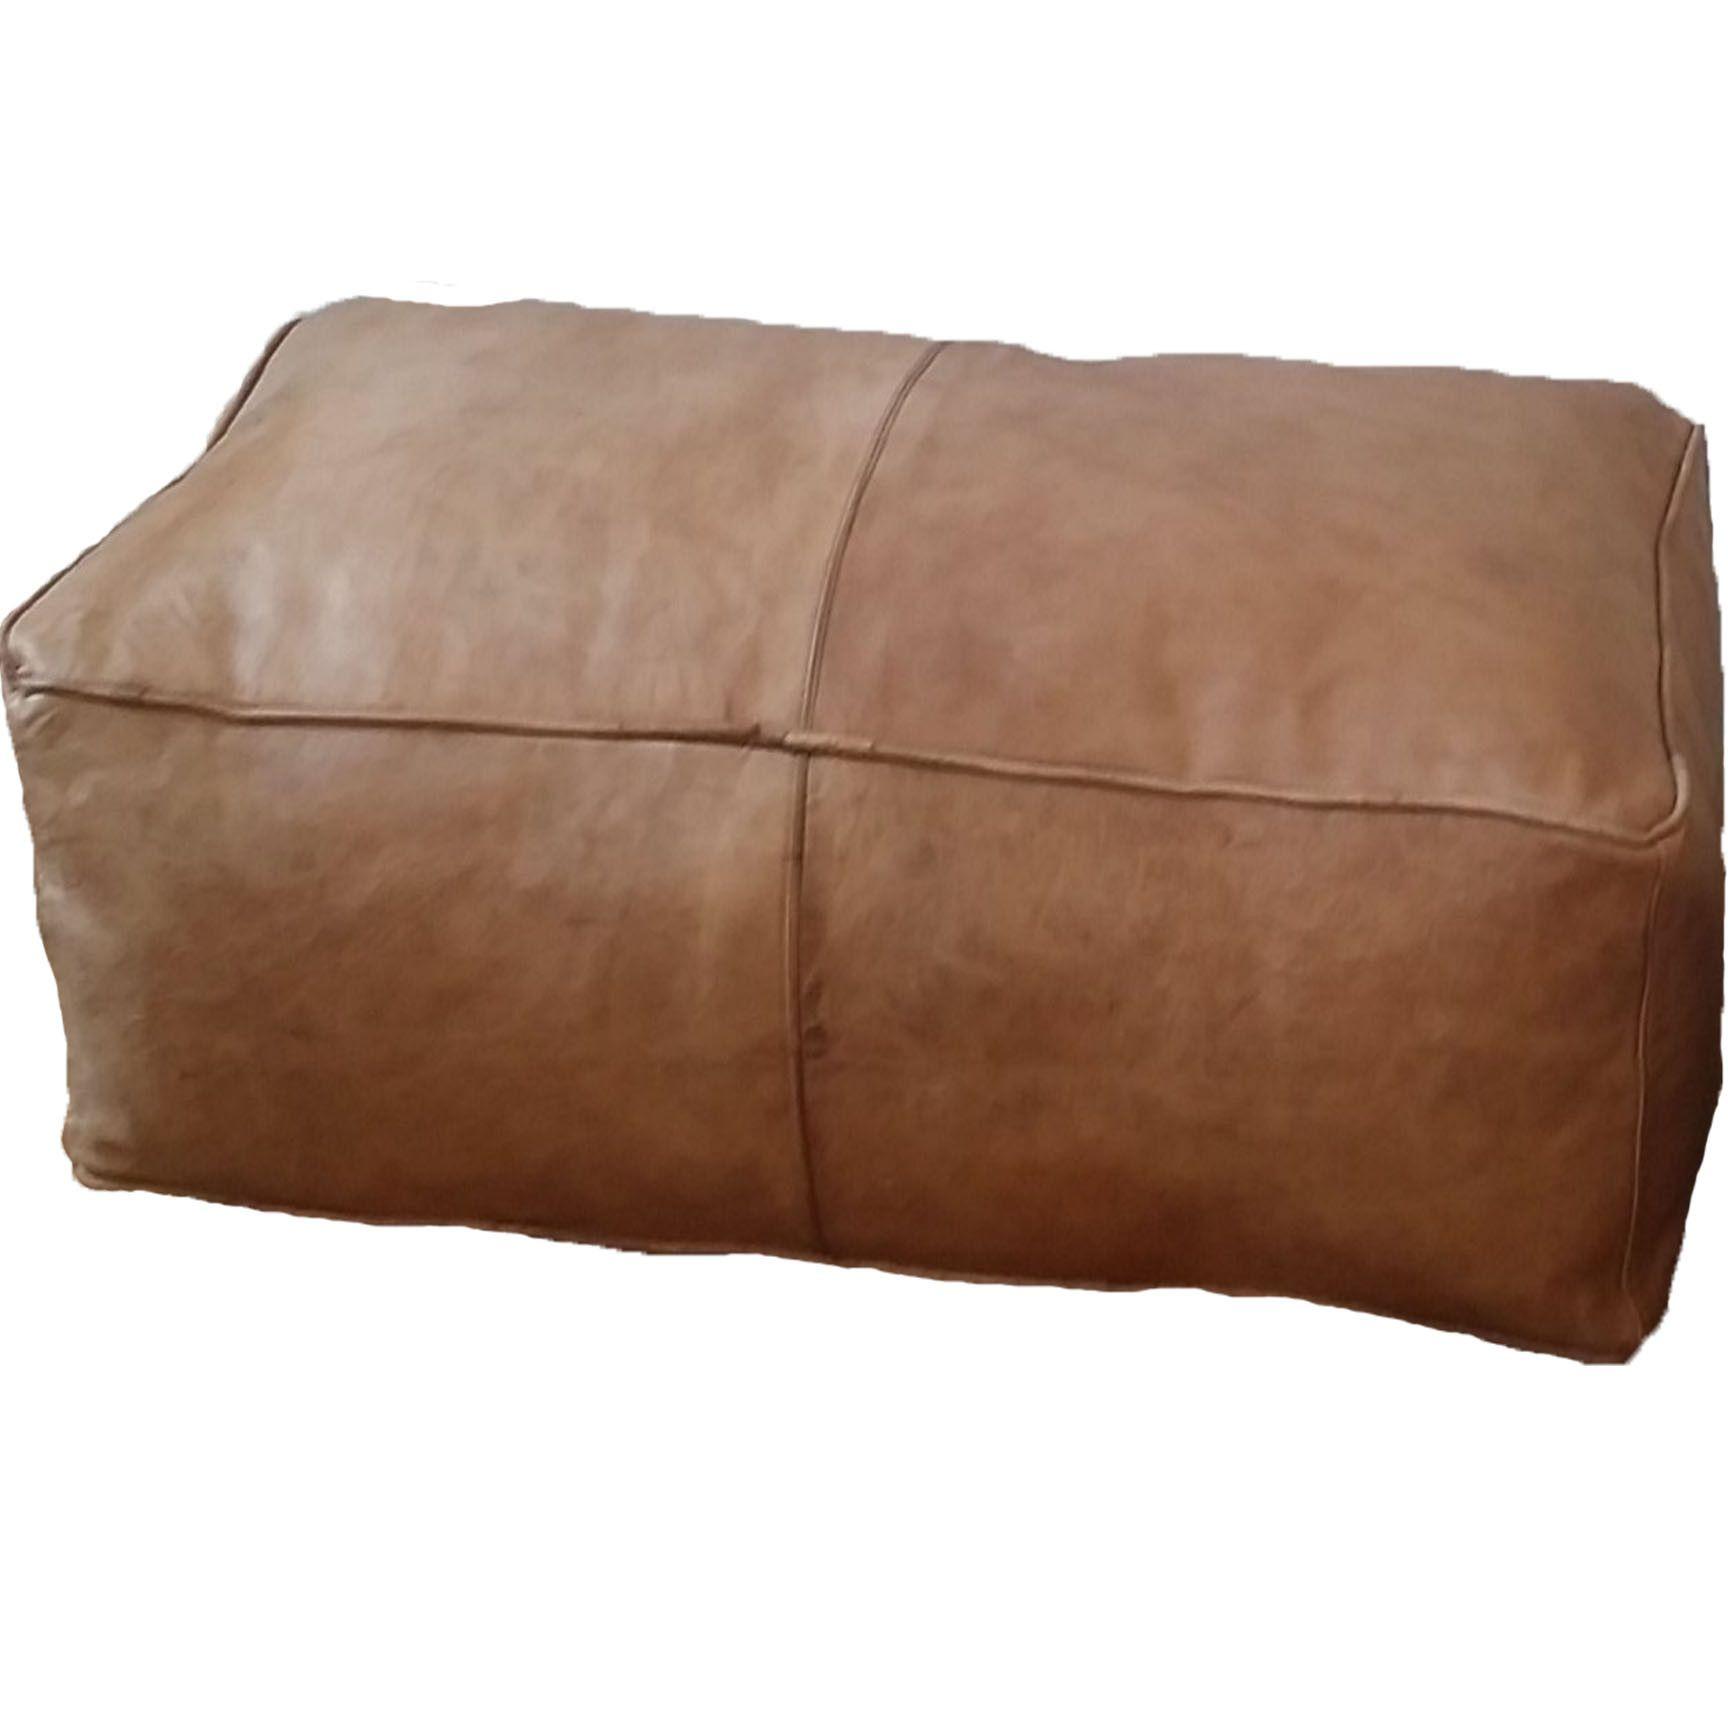 living room poufs%0A google docs resume builder